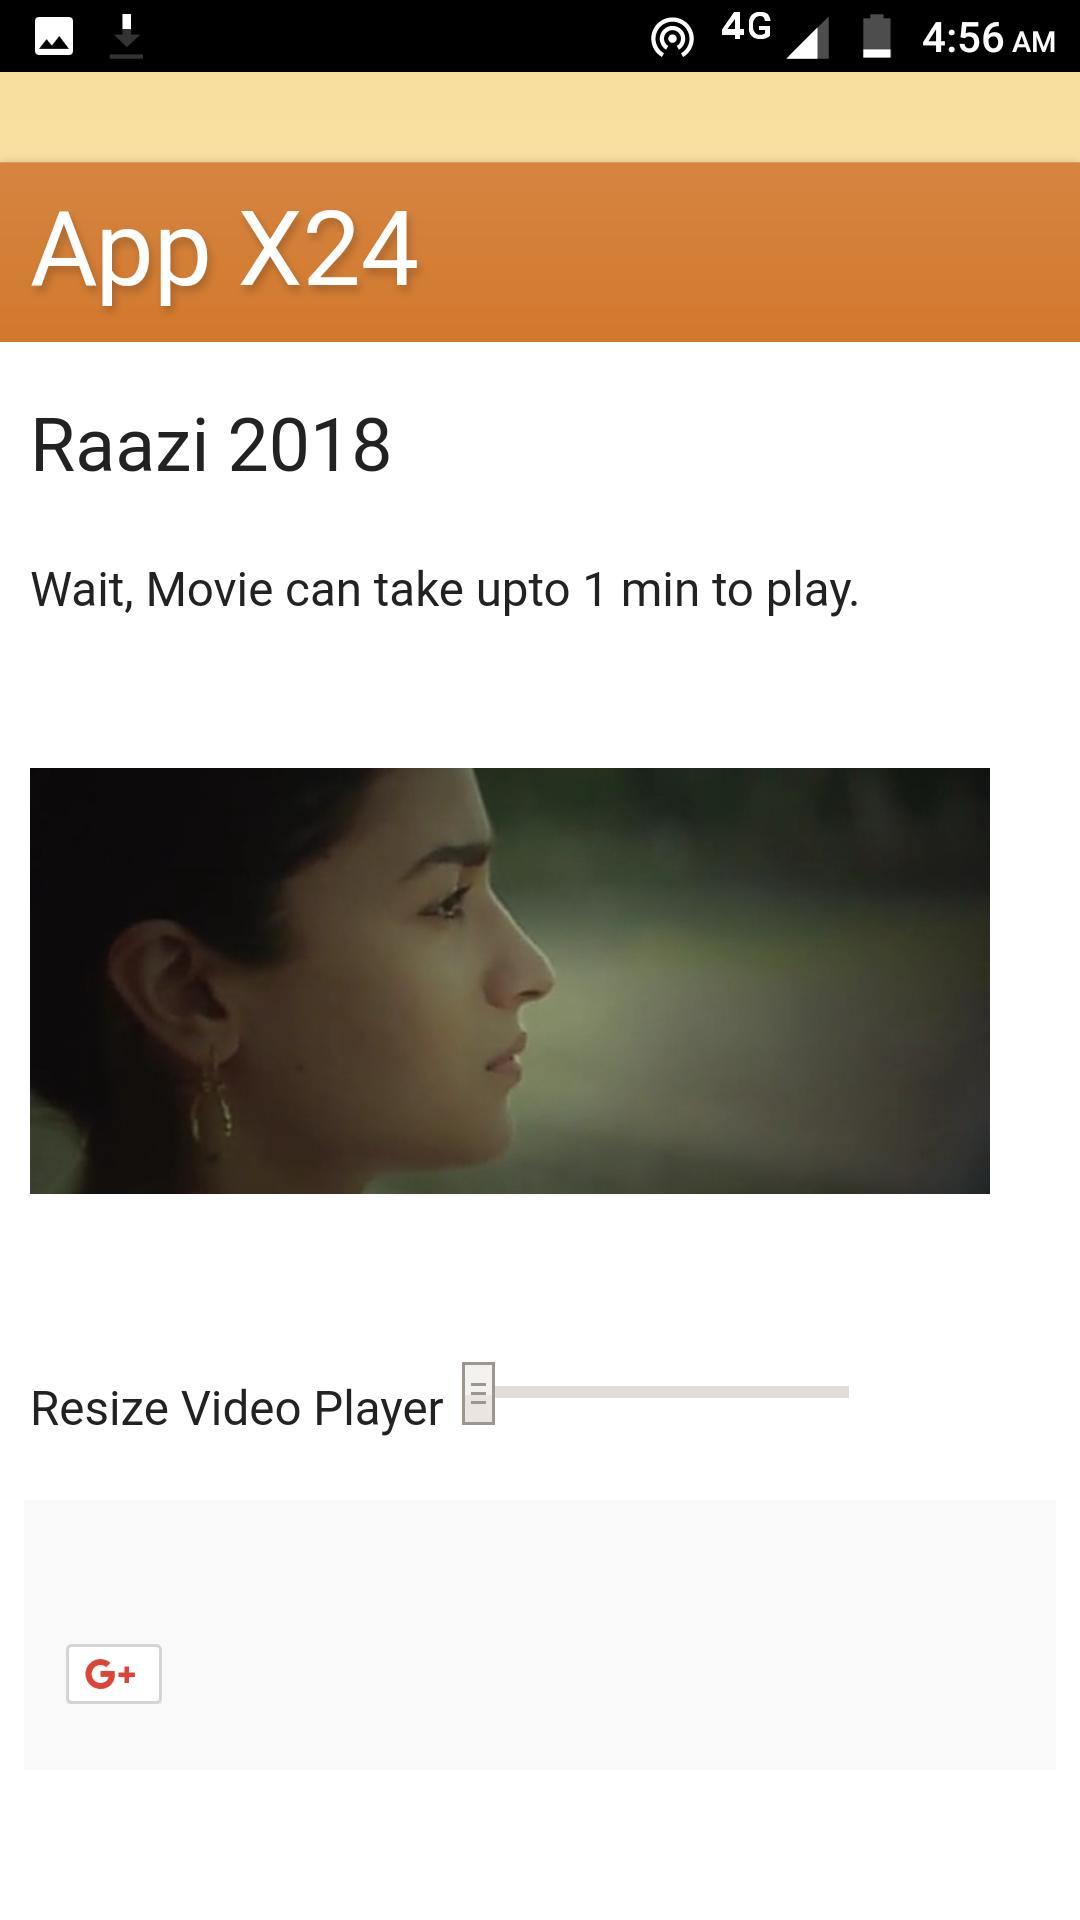 Raazi Full Movie 2018 Hd Alia Bhatt For Android Apk Download